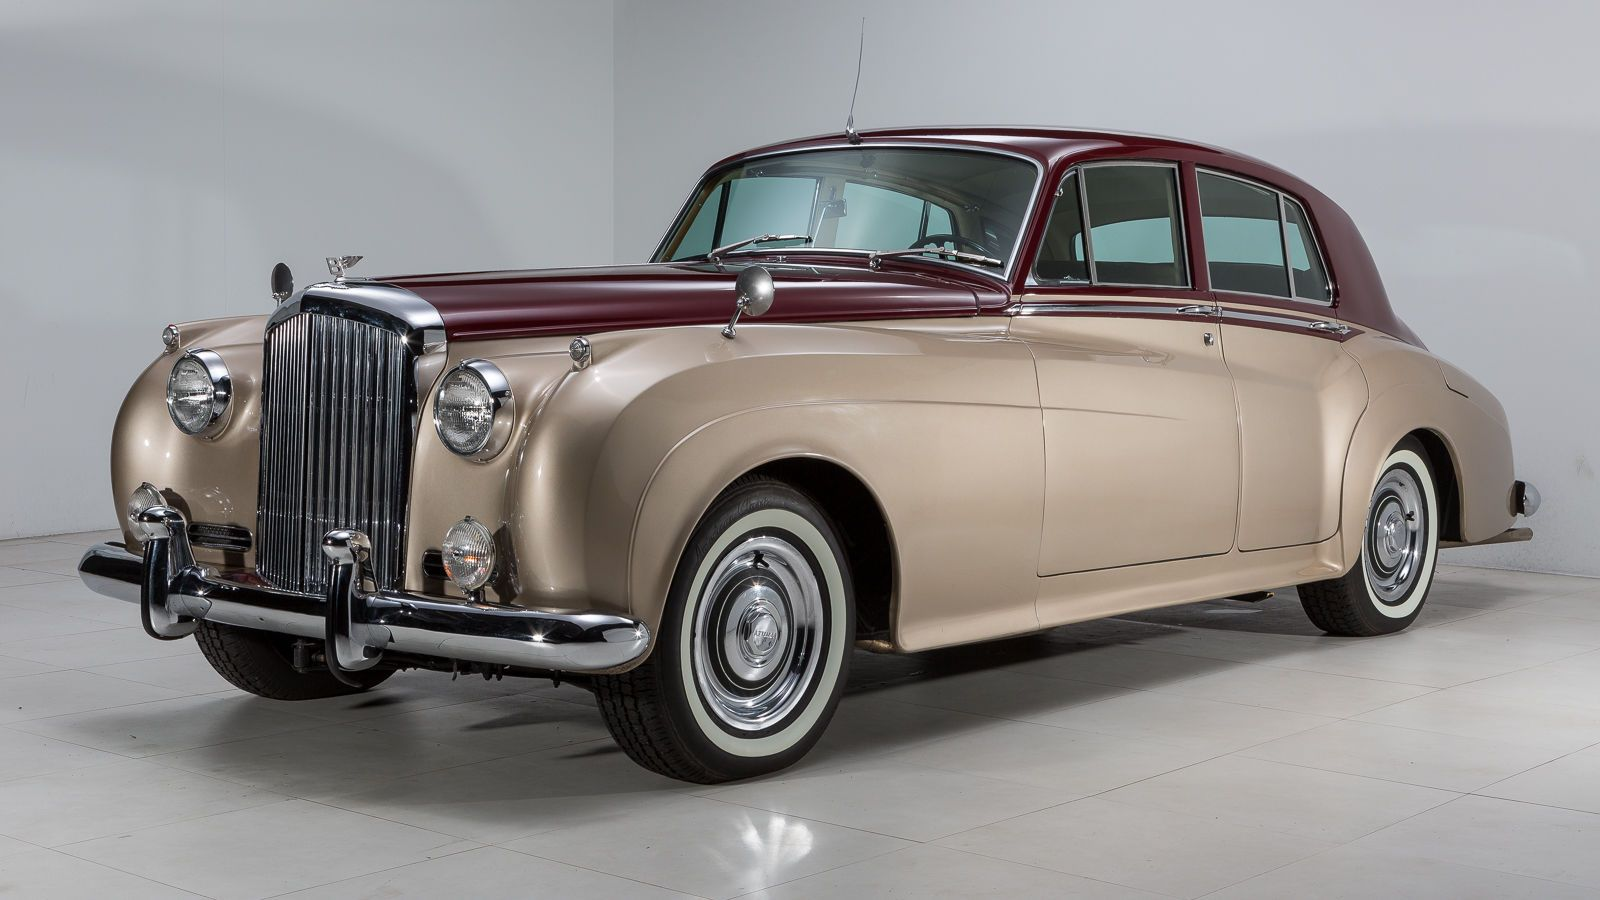 Luxury Limousine Vintage Bentley Rolls Royce Classic Cars With